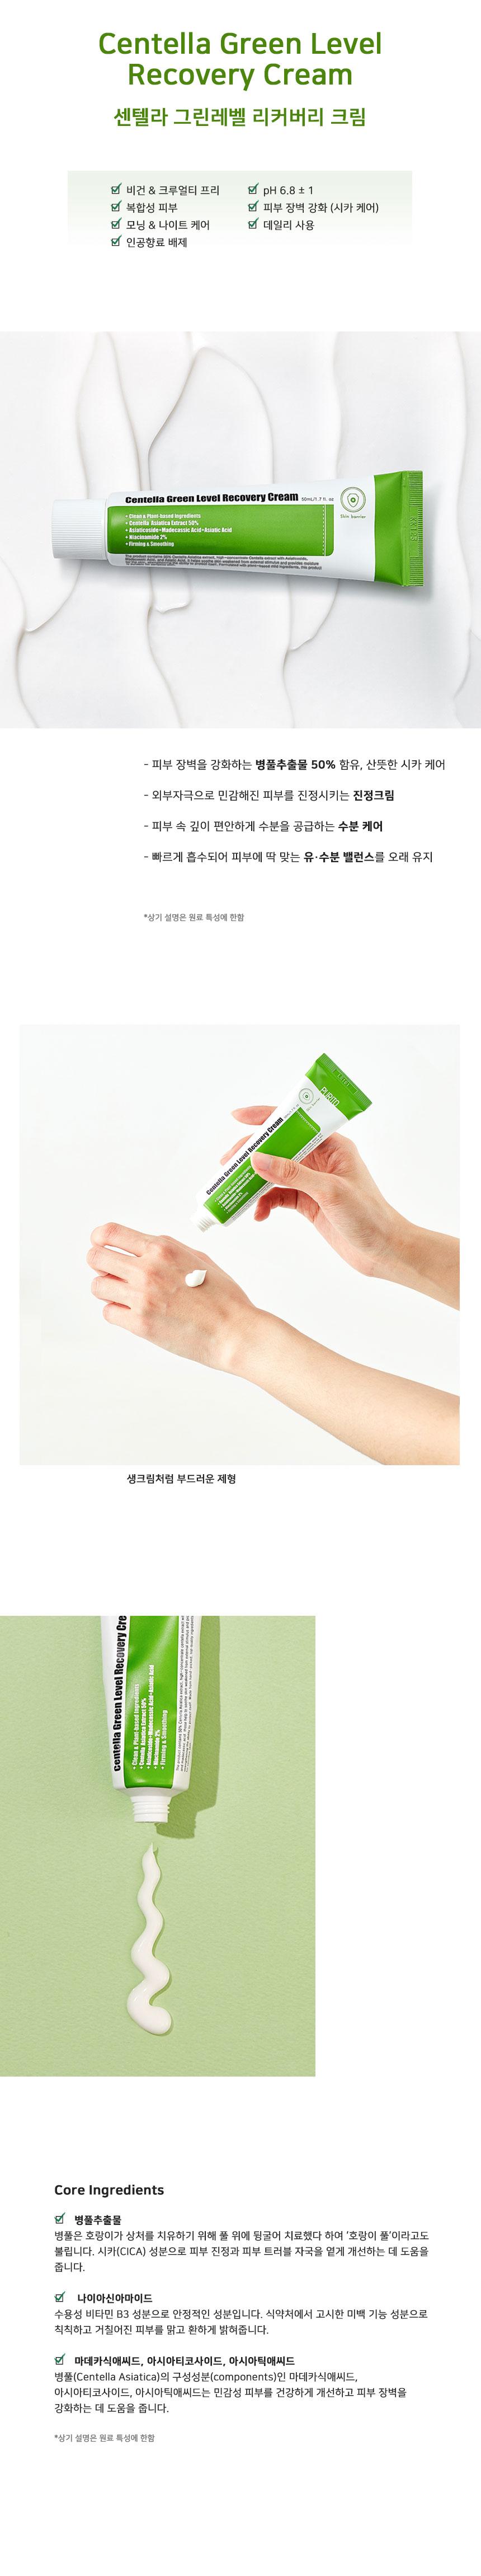 [PURITO] Centella Green Level Recovery Cream 50ml - Riyadh - Saudi Arabia - Cash On Delivery - Kshopina